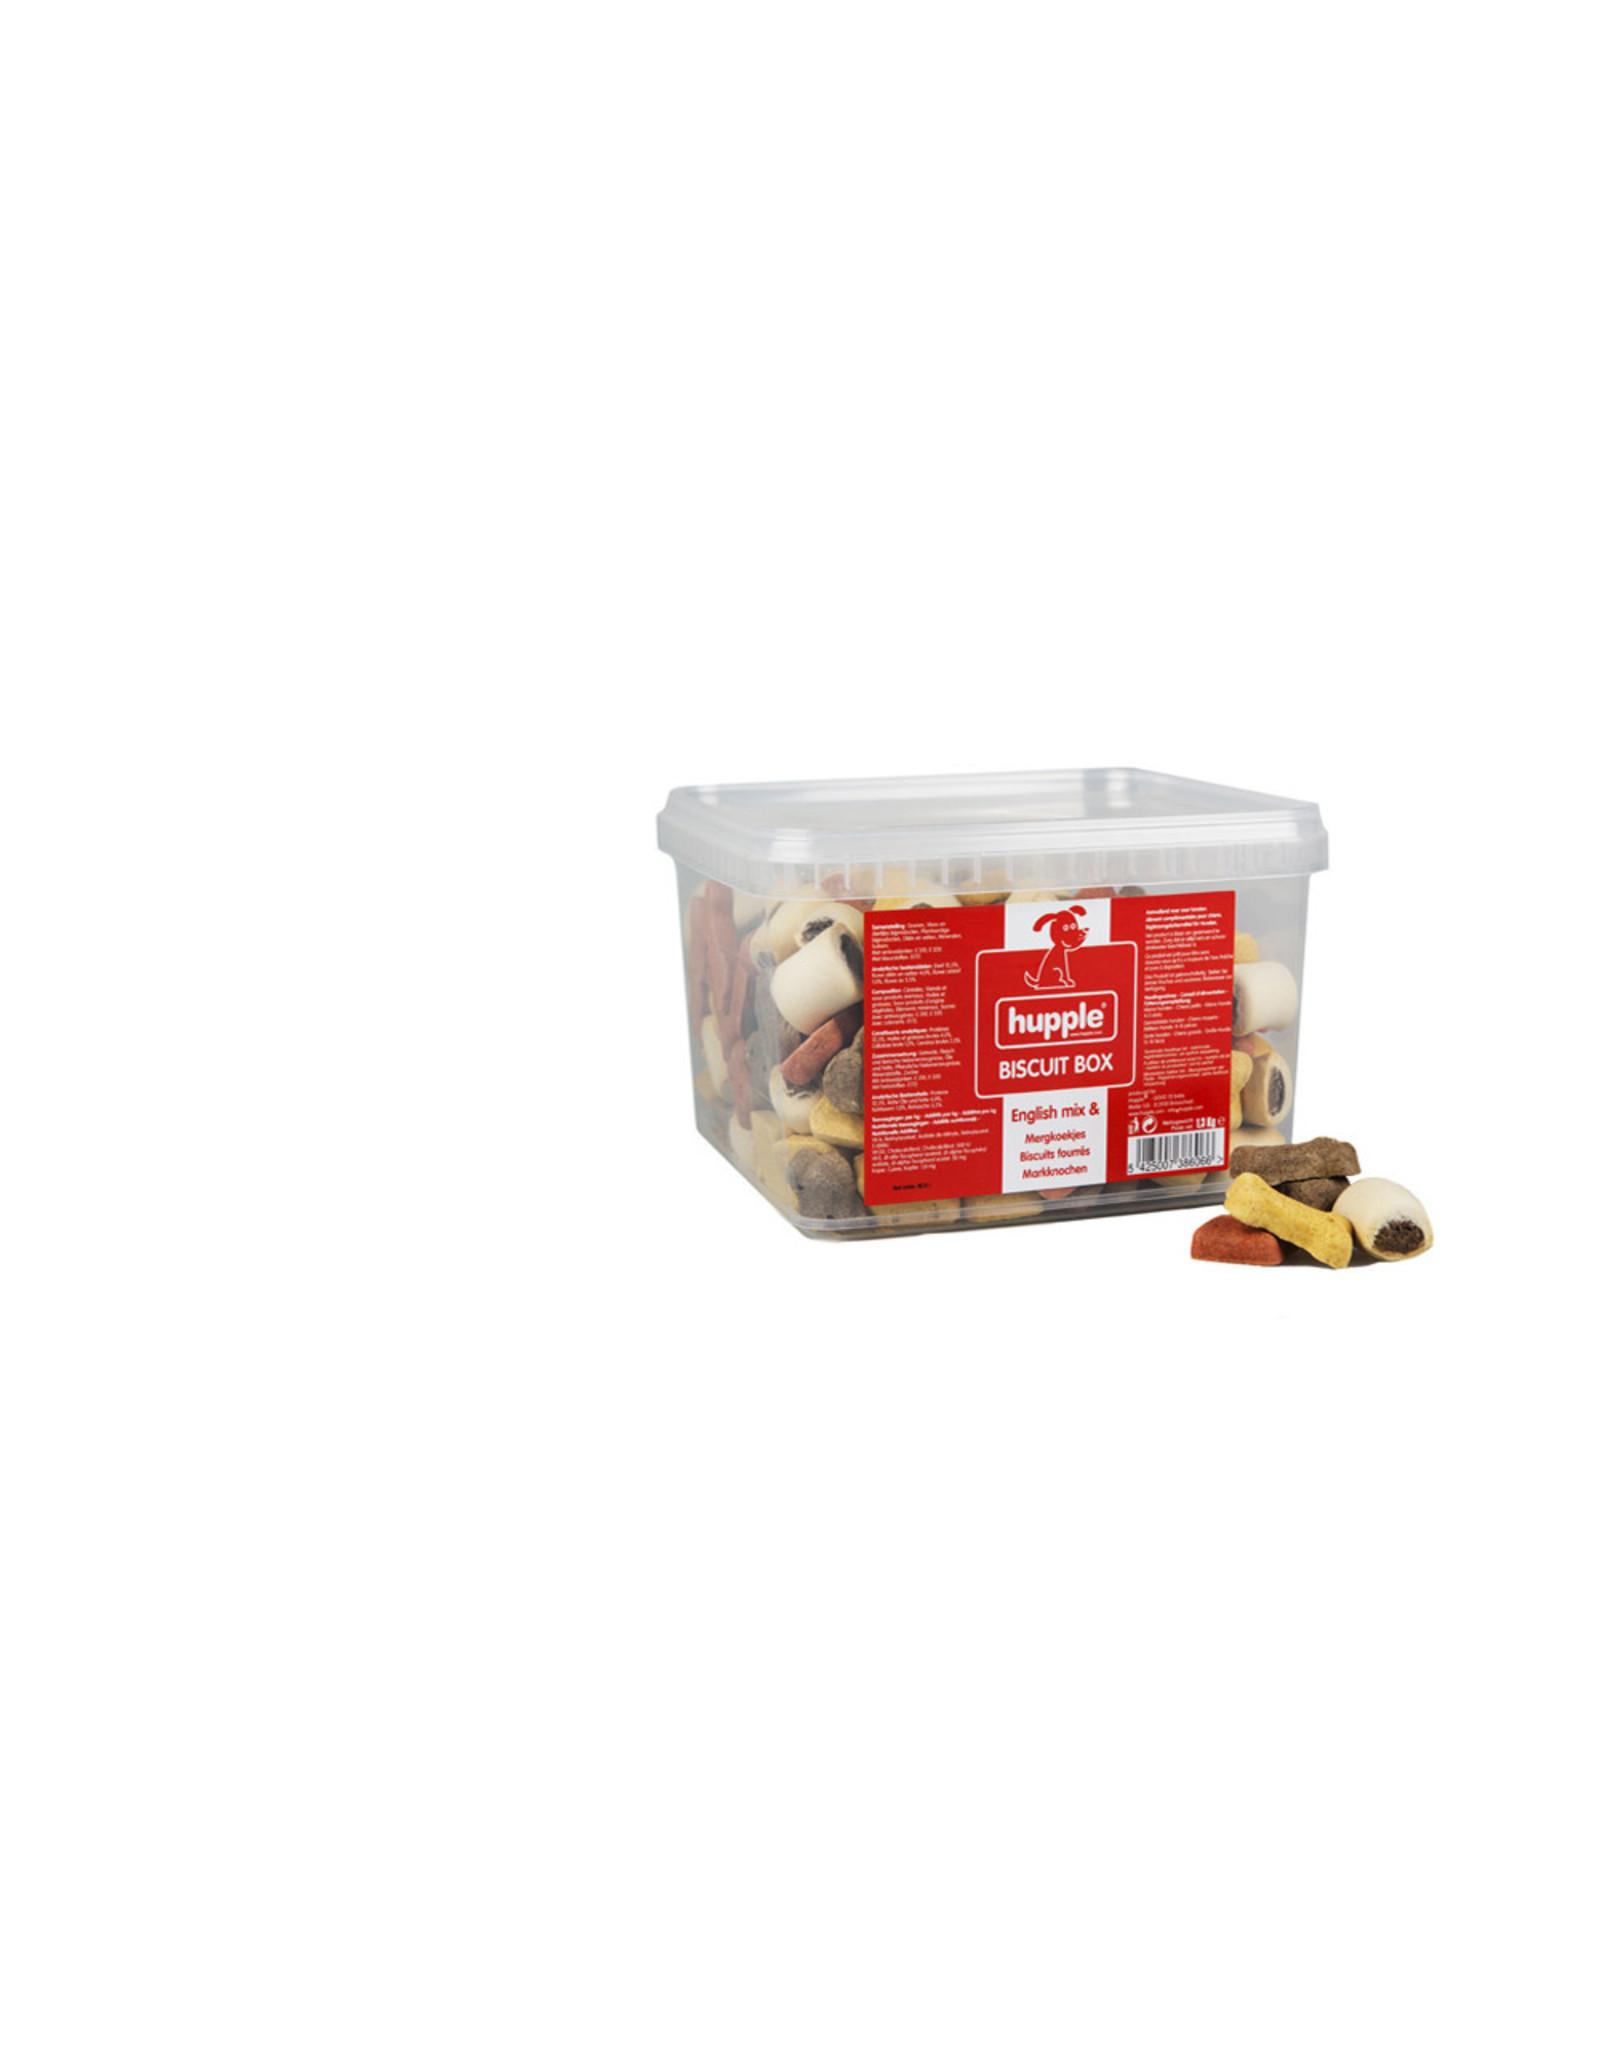 Hupple Biscuits   English Mix 1.3kg